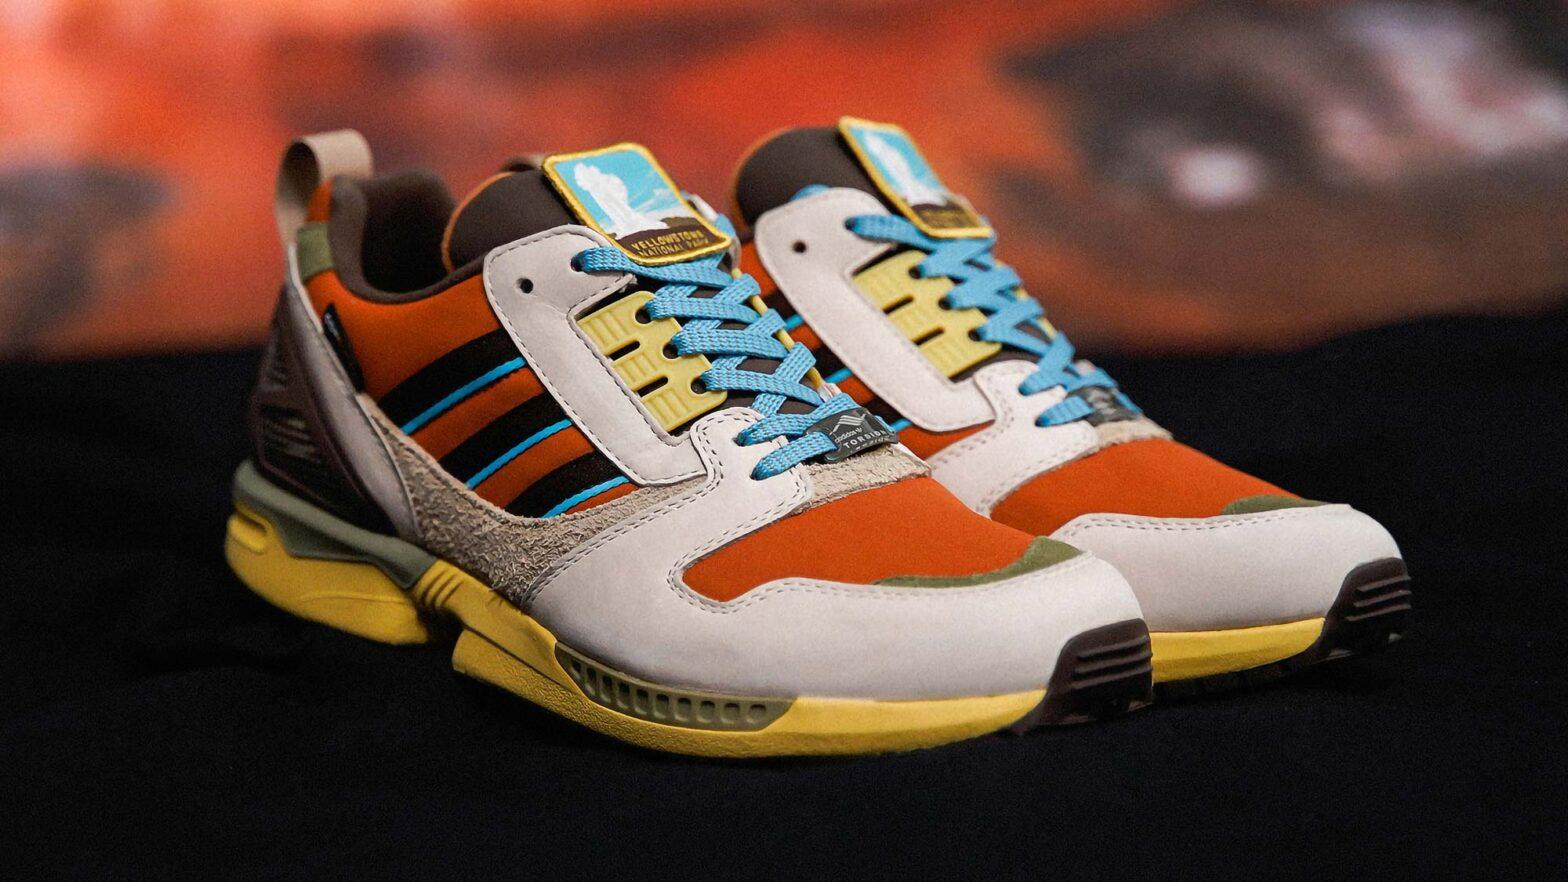 adidas Originals x National Park Foundation Sneakers